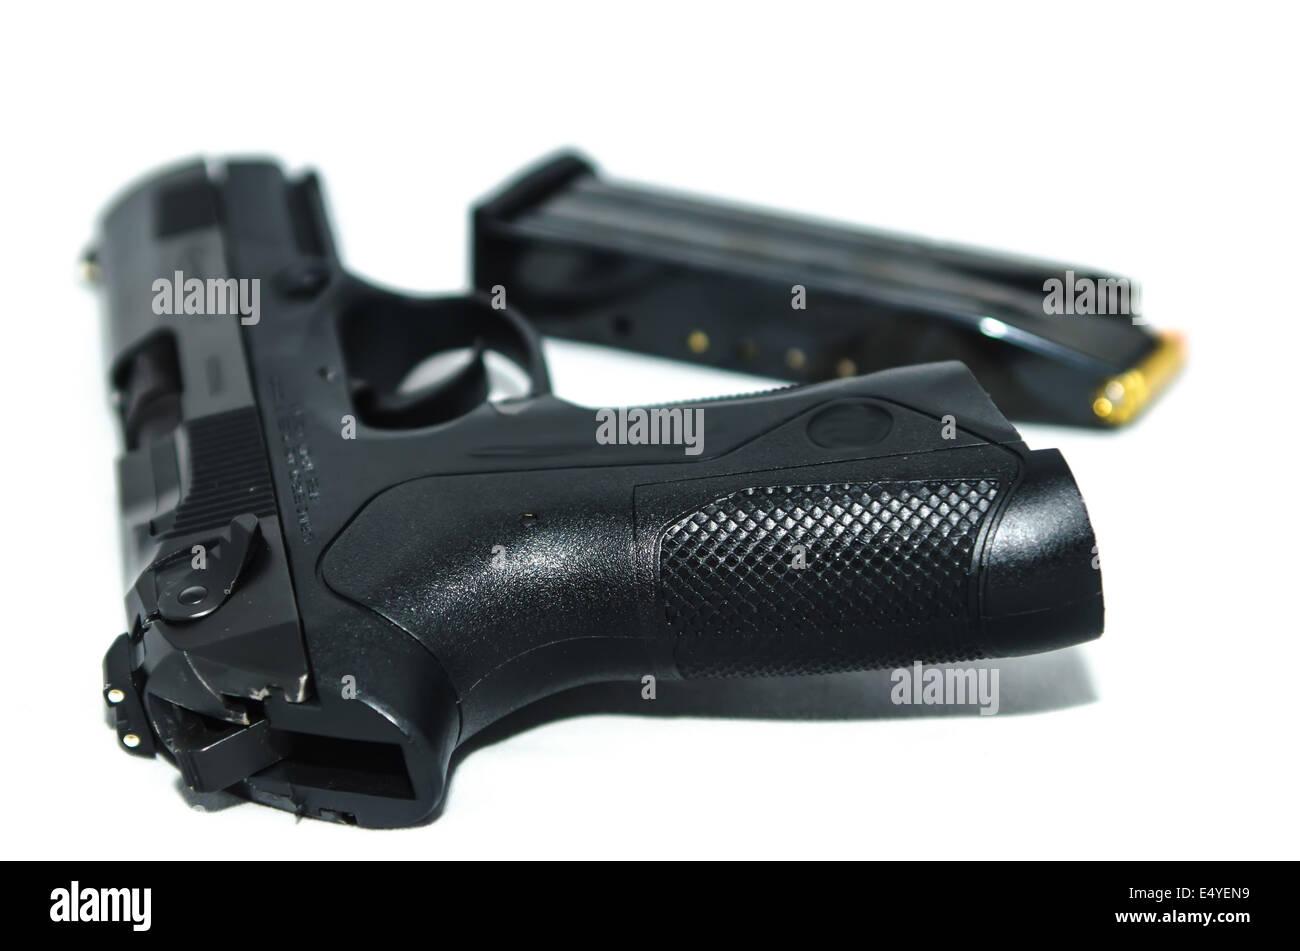 9mm gun and ammo - Stock Image